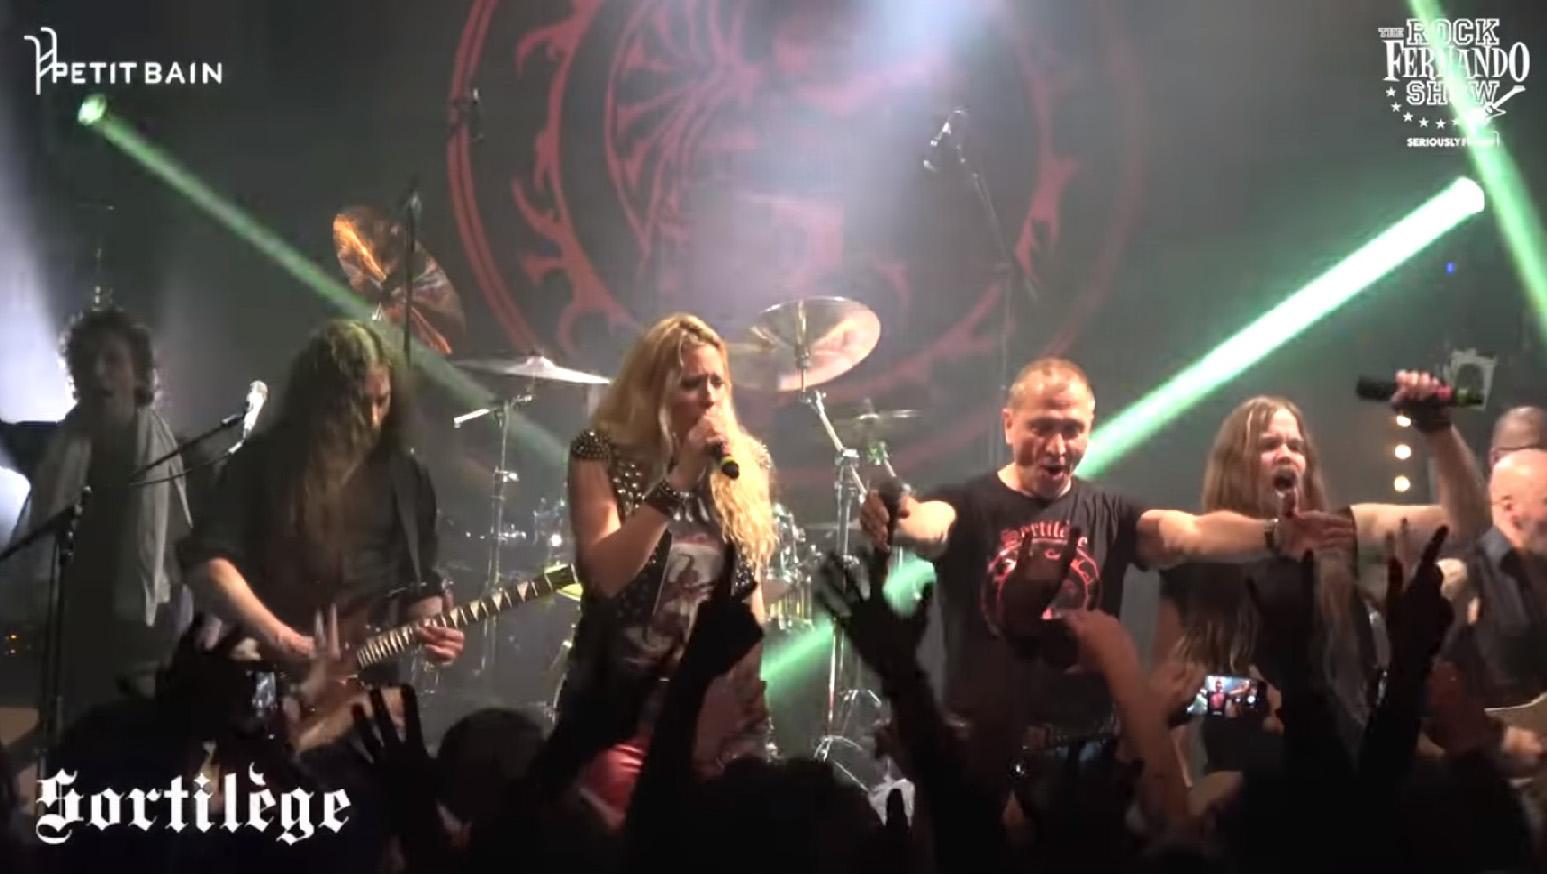 FERNANDO ROCK SHOW : Tribute SORTILEGE live au Petit Bain le Vendredi 19 Avril 2019   Sortil21